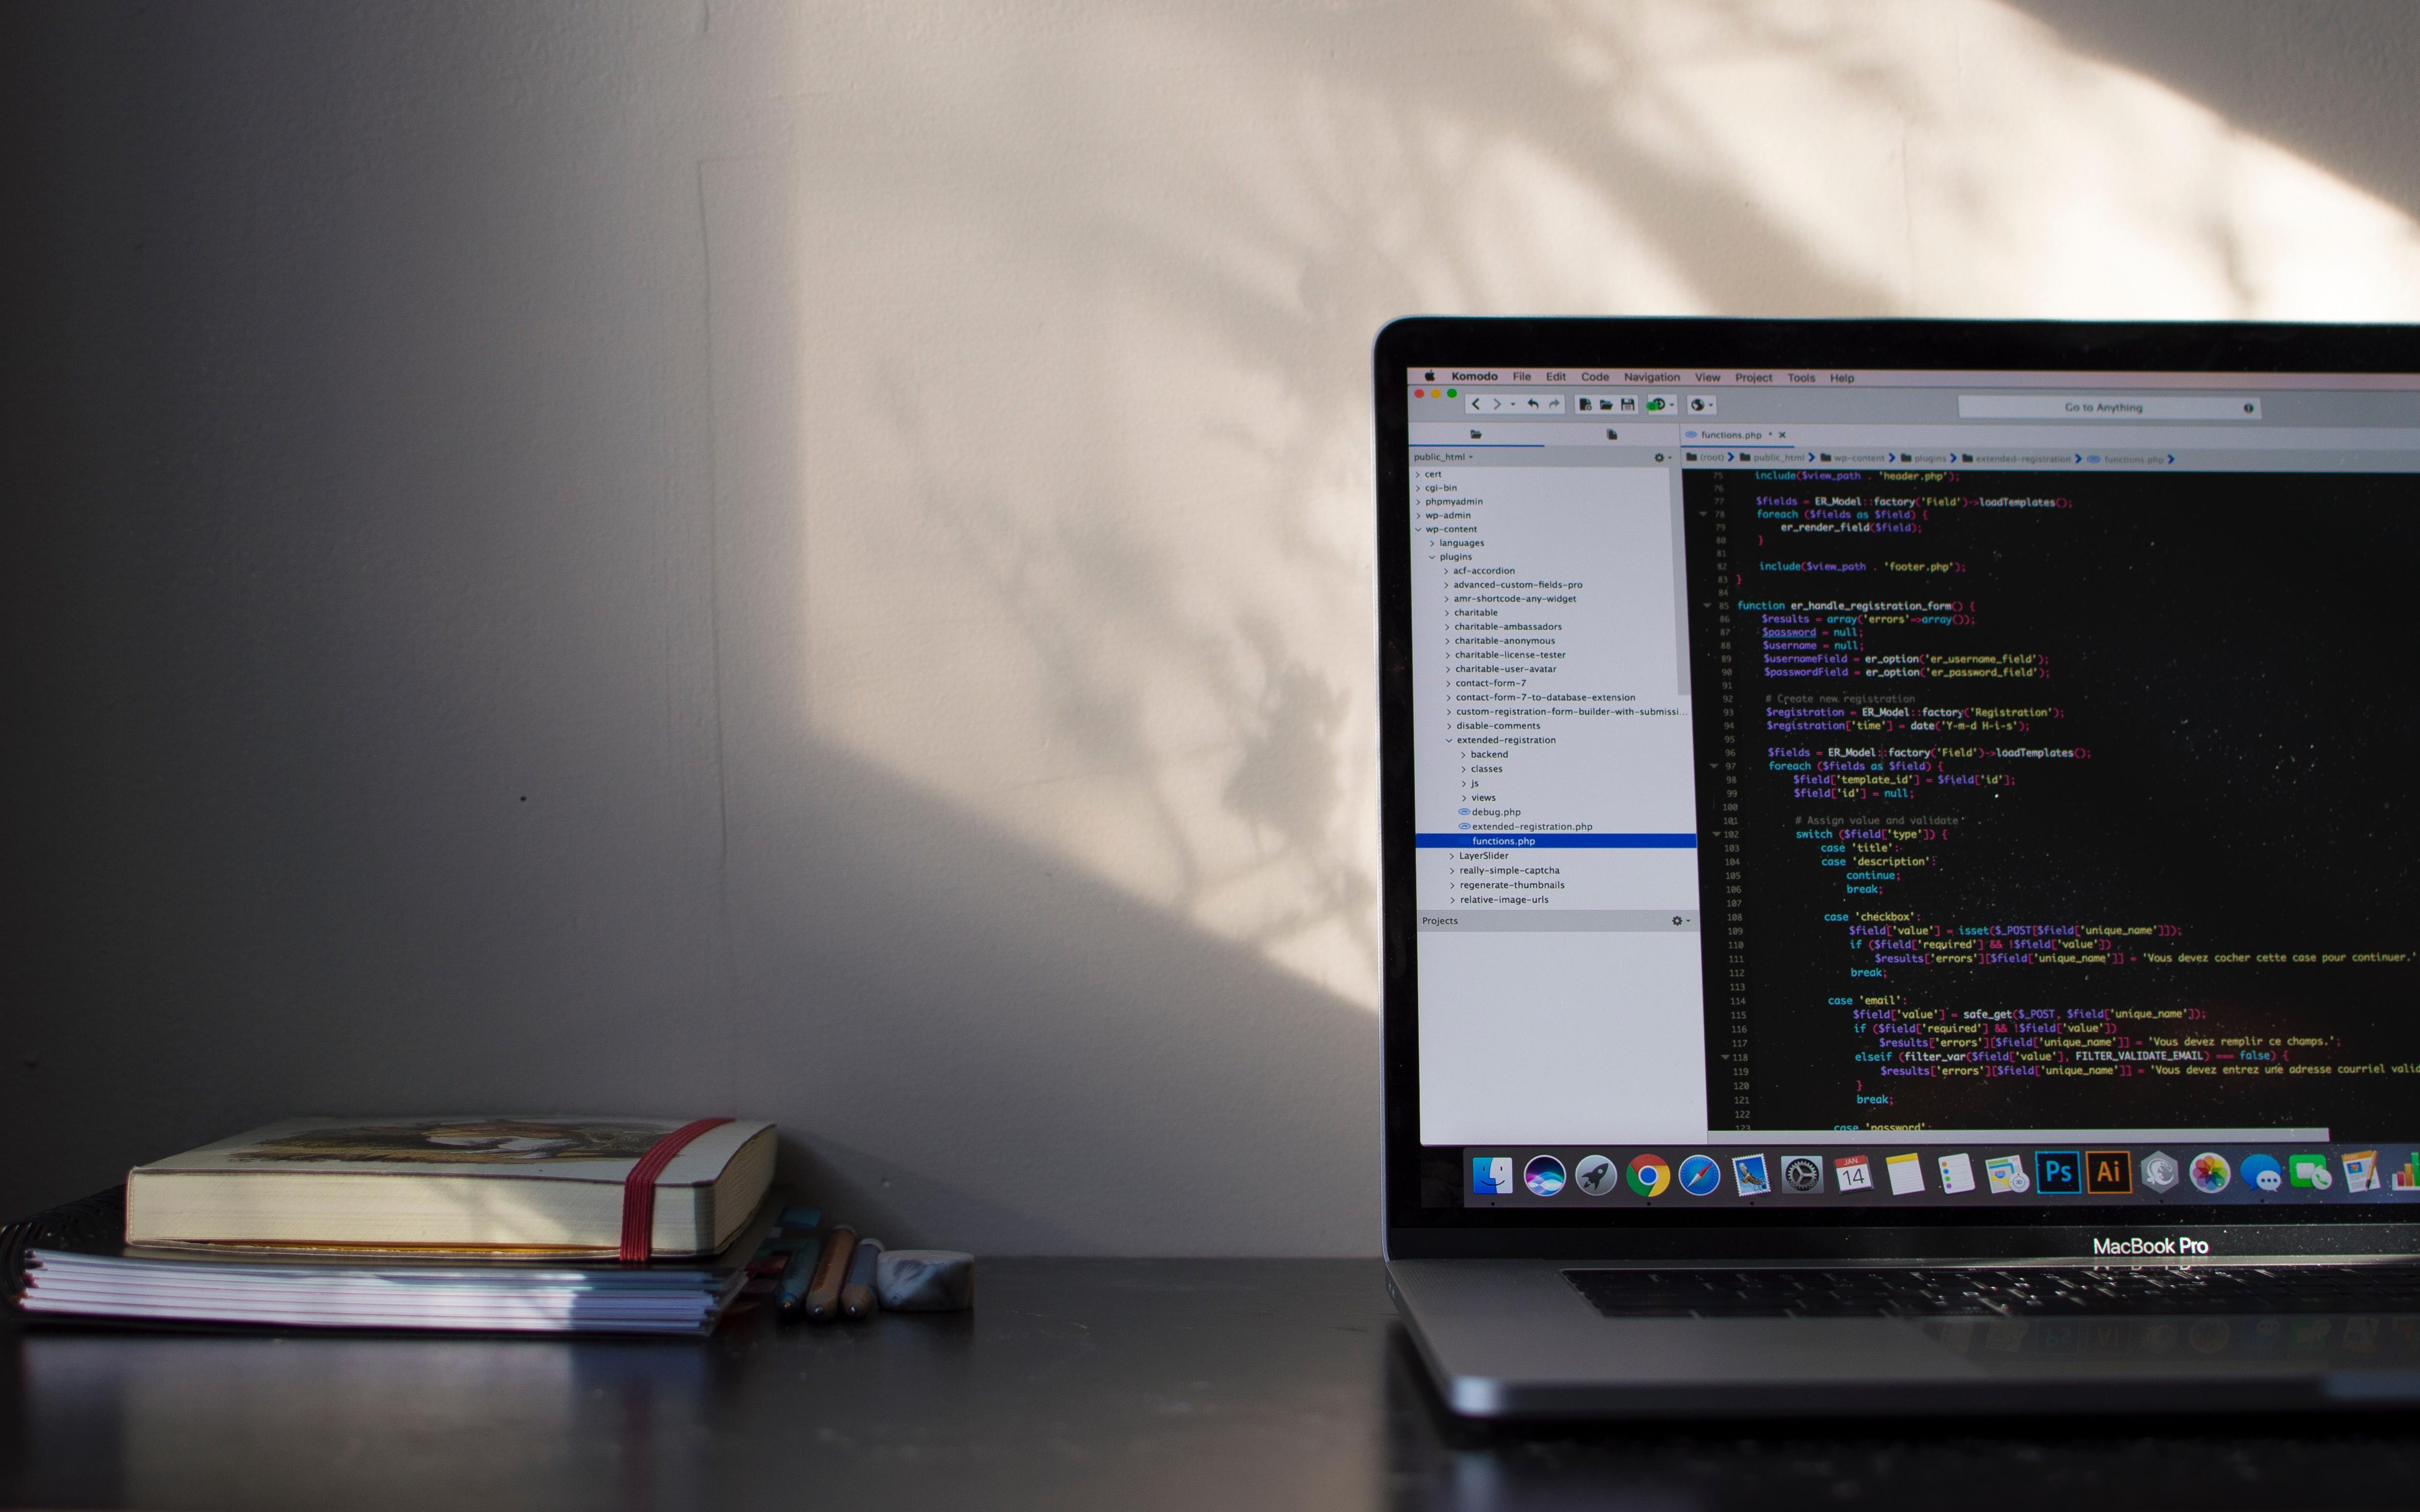 Should Your Browser Make Client-Side Web API Calls?